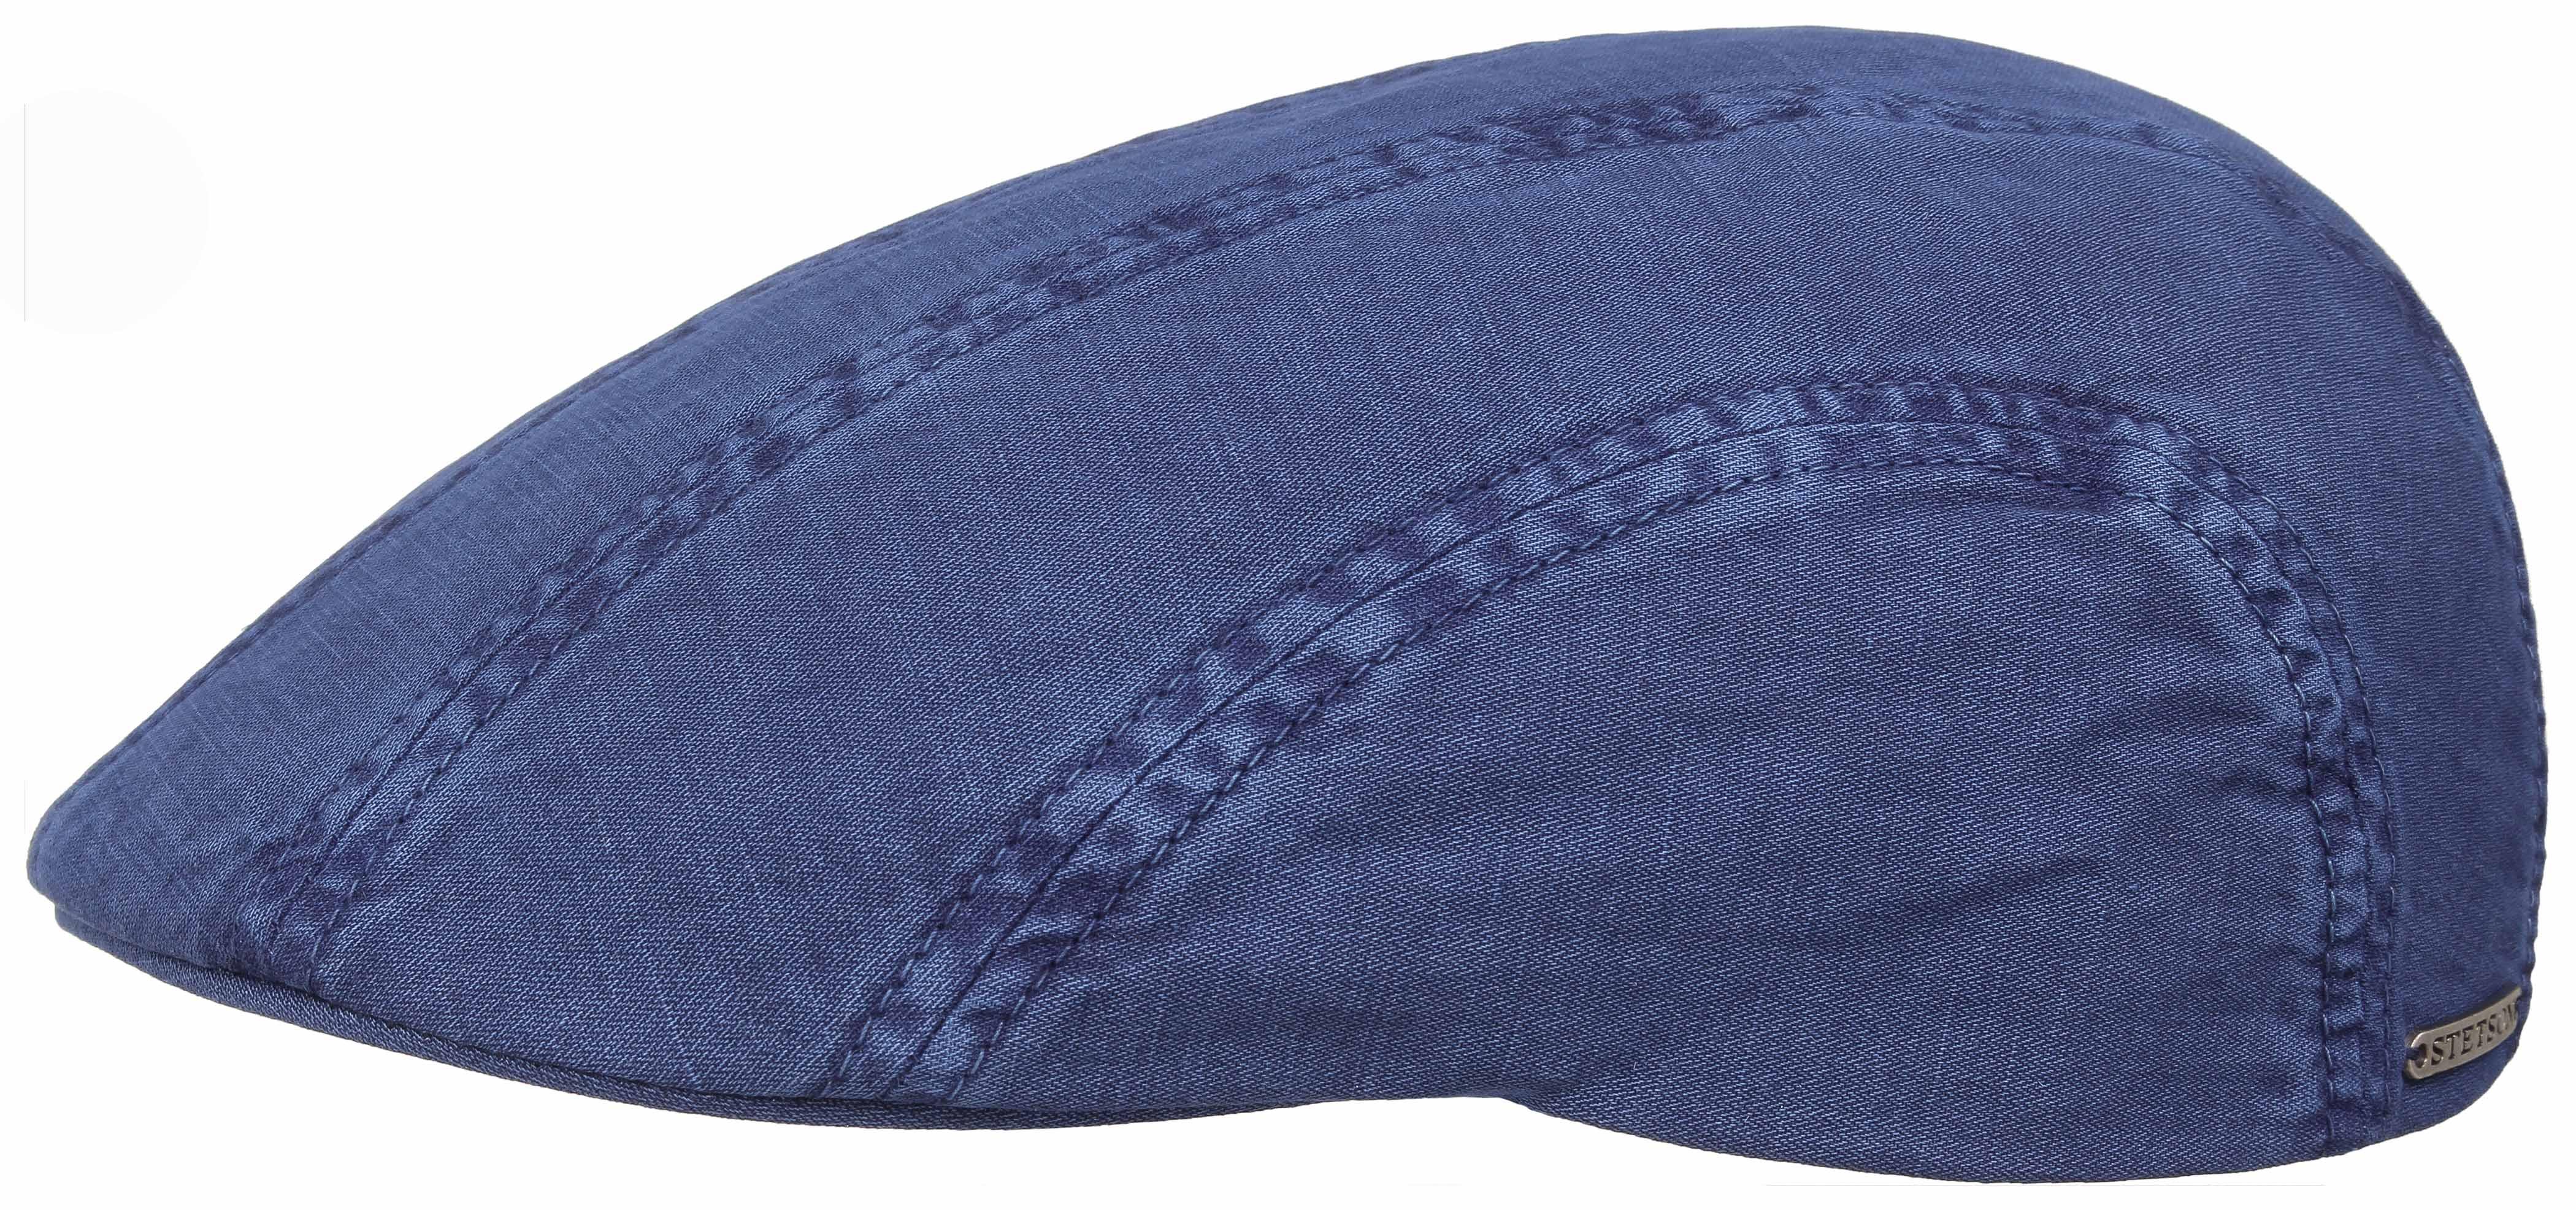 Casquette plate Madison Dye Stetson bleu - Kausia f30ff2f4b30